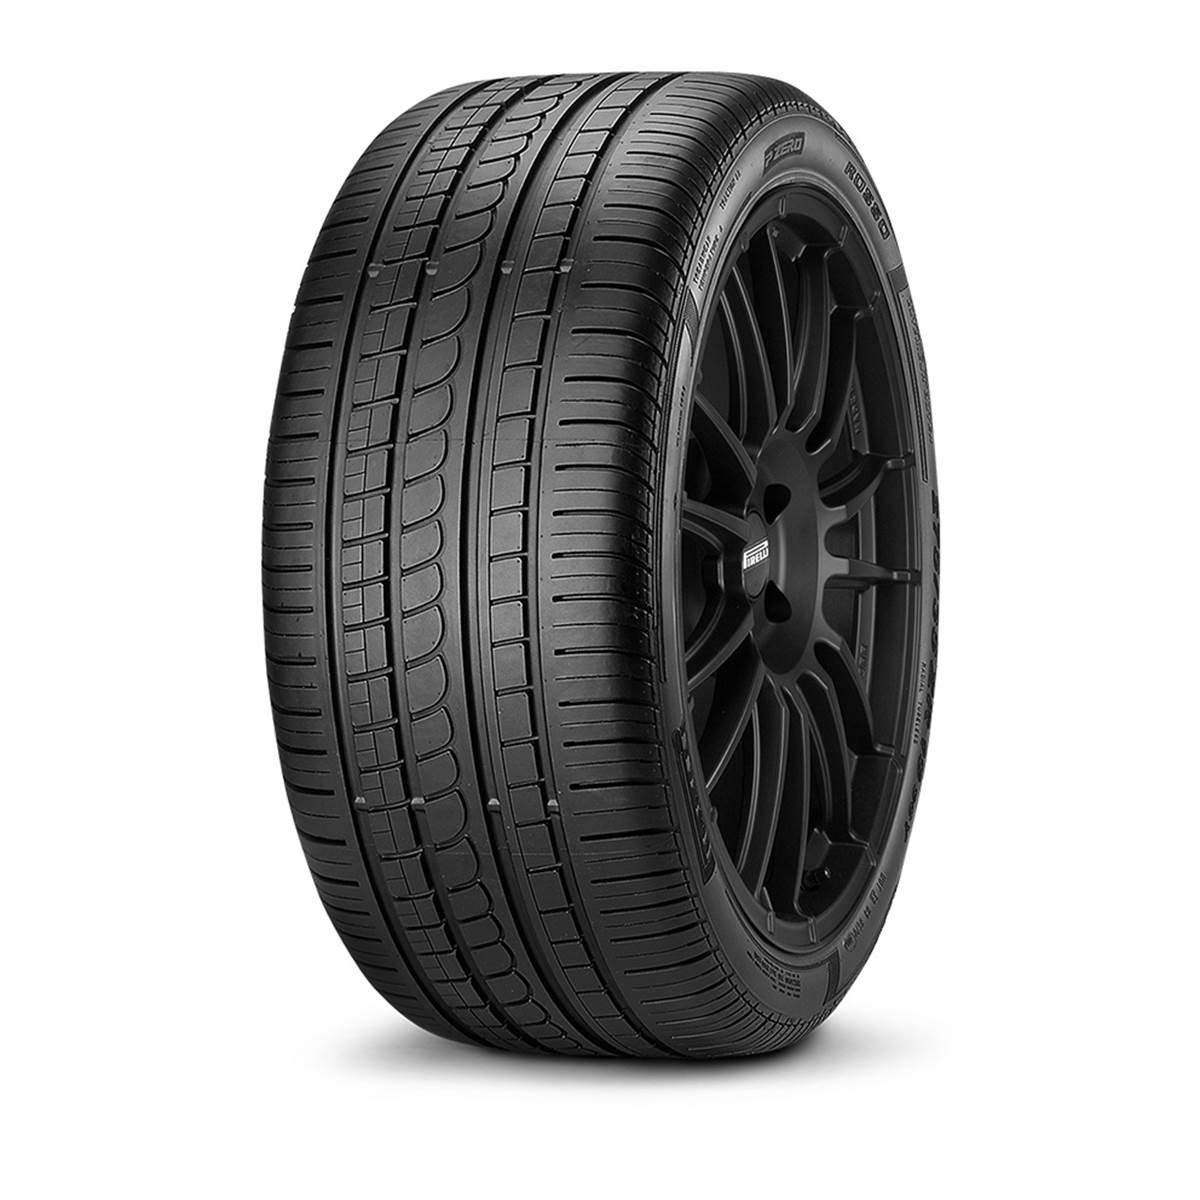 Pneu Pirelli 255/30R20 92Y Pzero Nero (Gt) XL